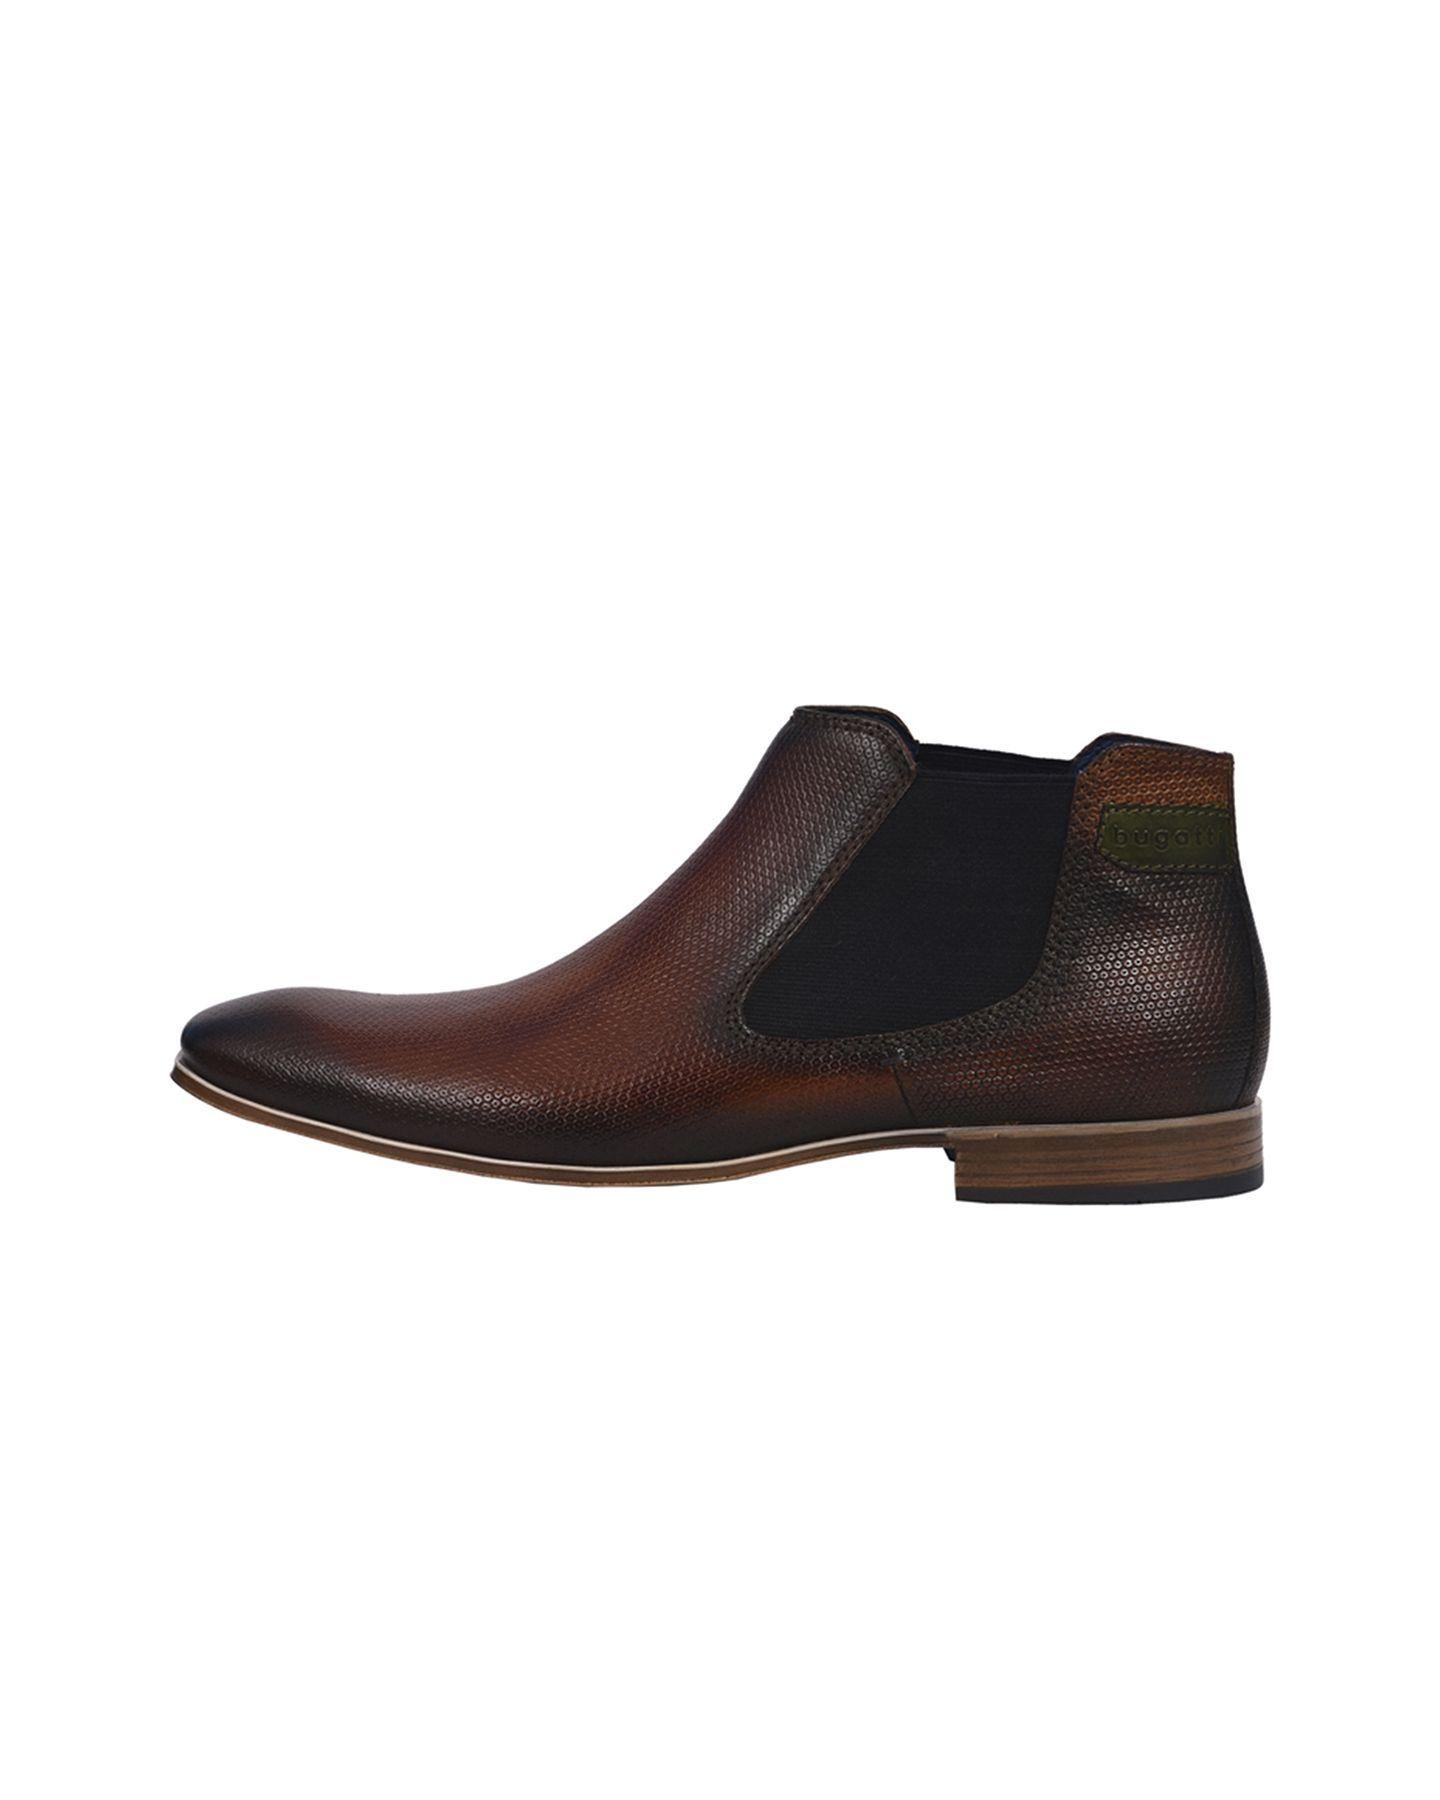 bugatti Chelsea boots in cognac in Größe 44